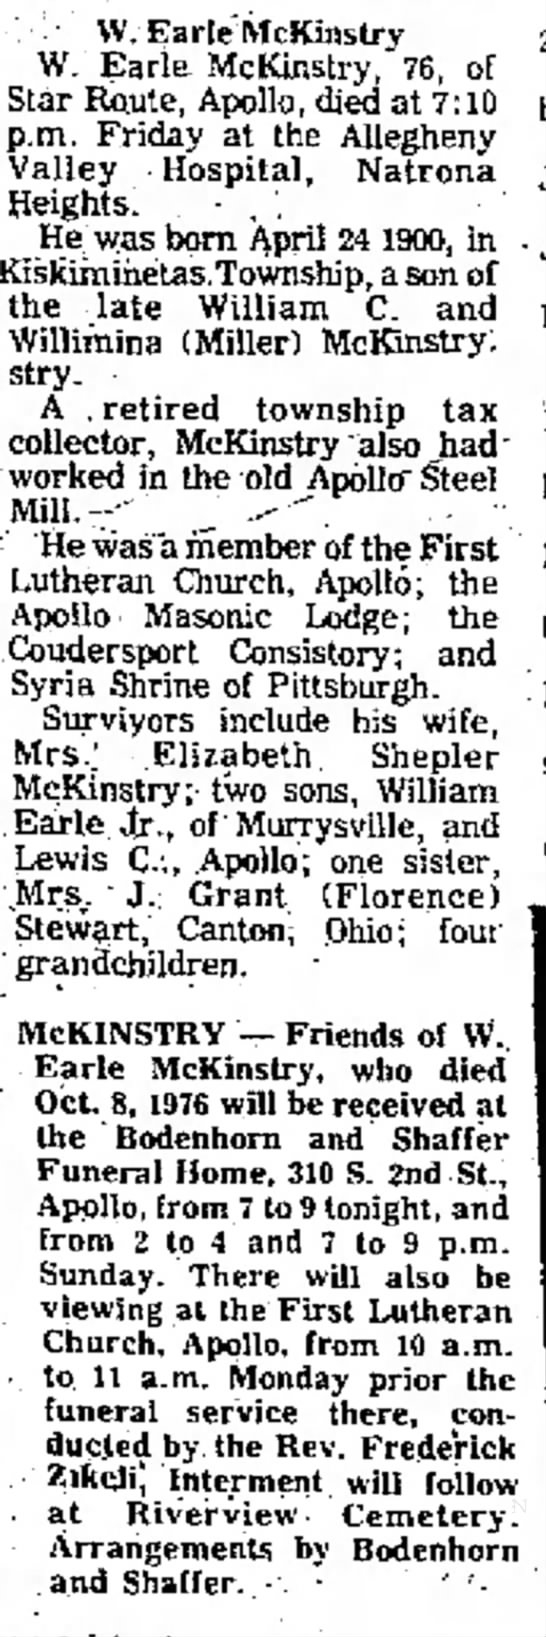 w earle mckinstry obituary -